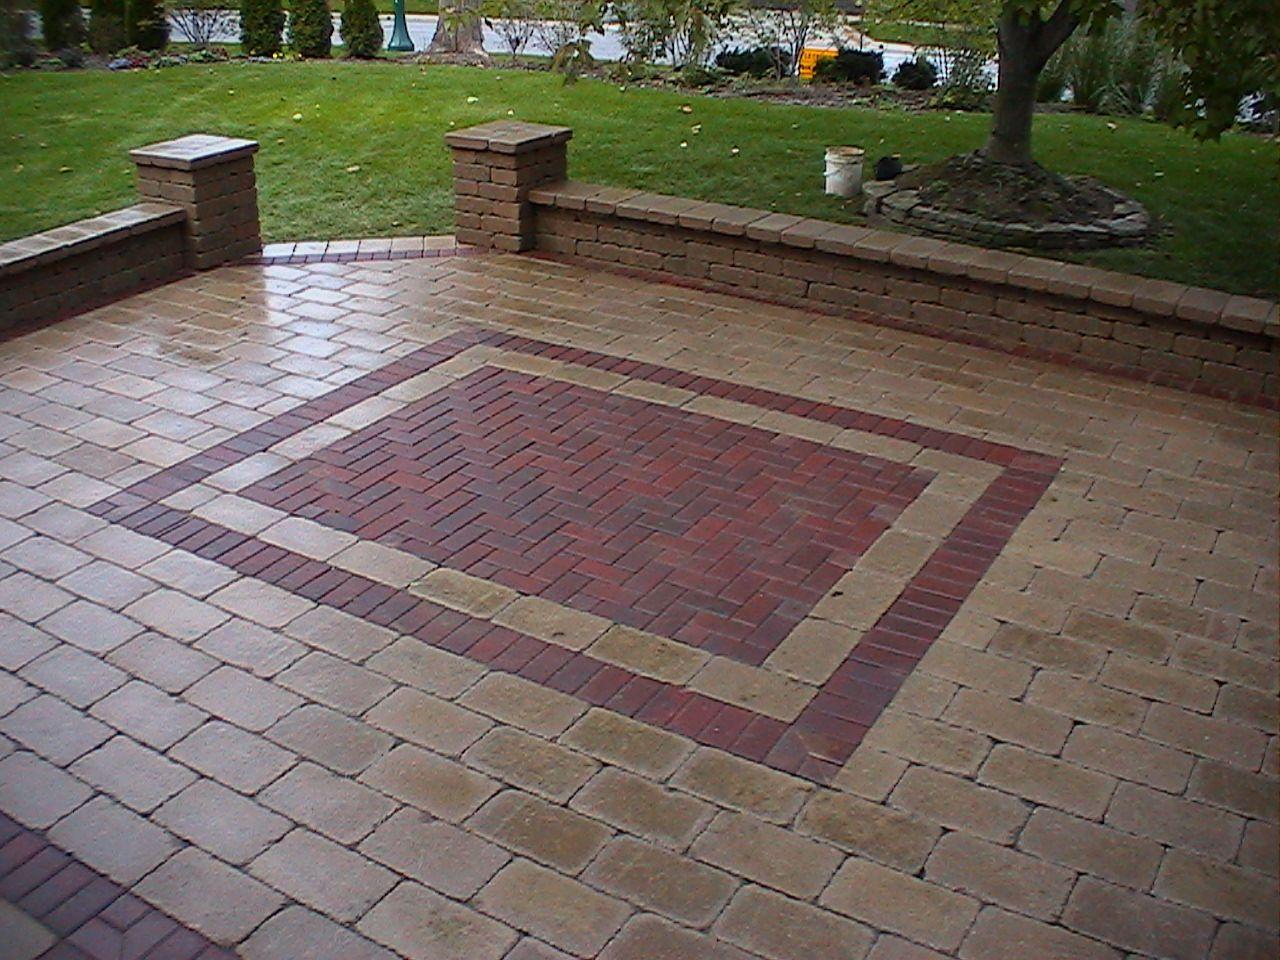 brick patio | Brick patios, Patio design on Red Paver Patio Ideas id=69744